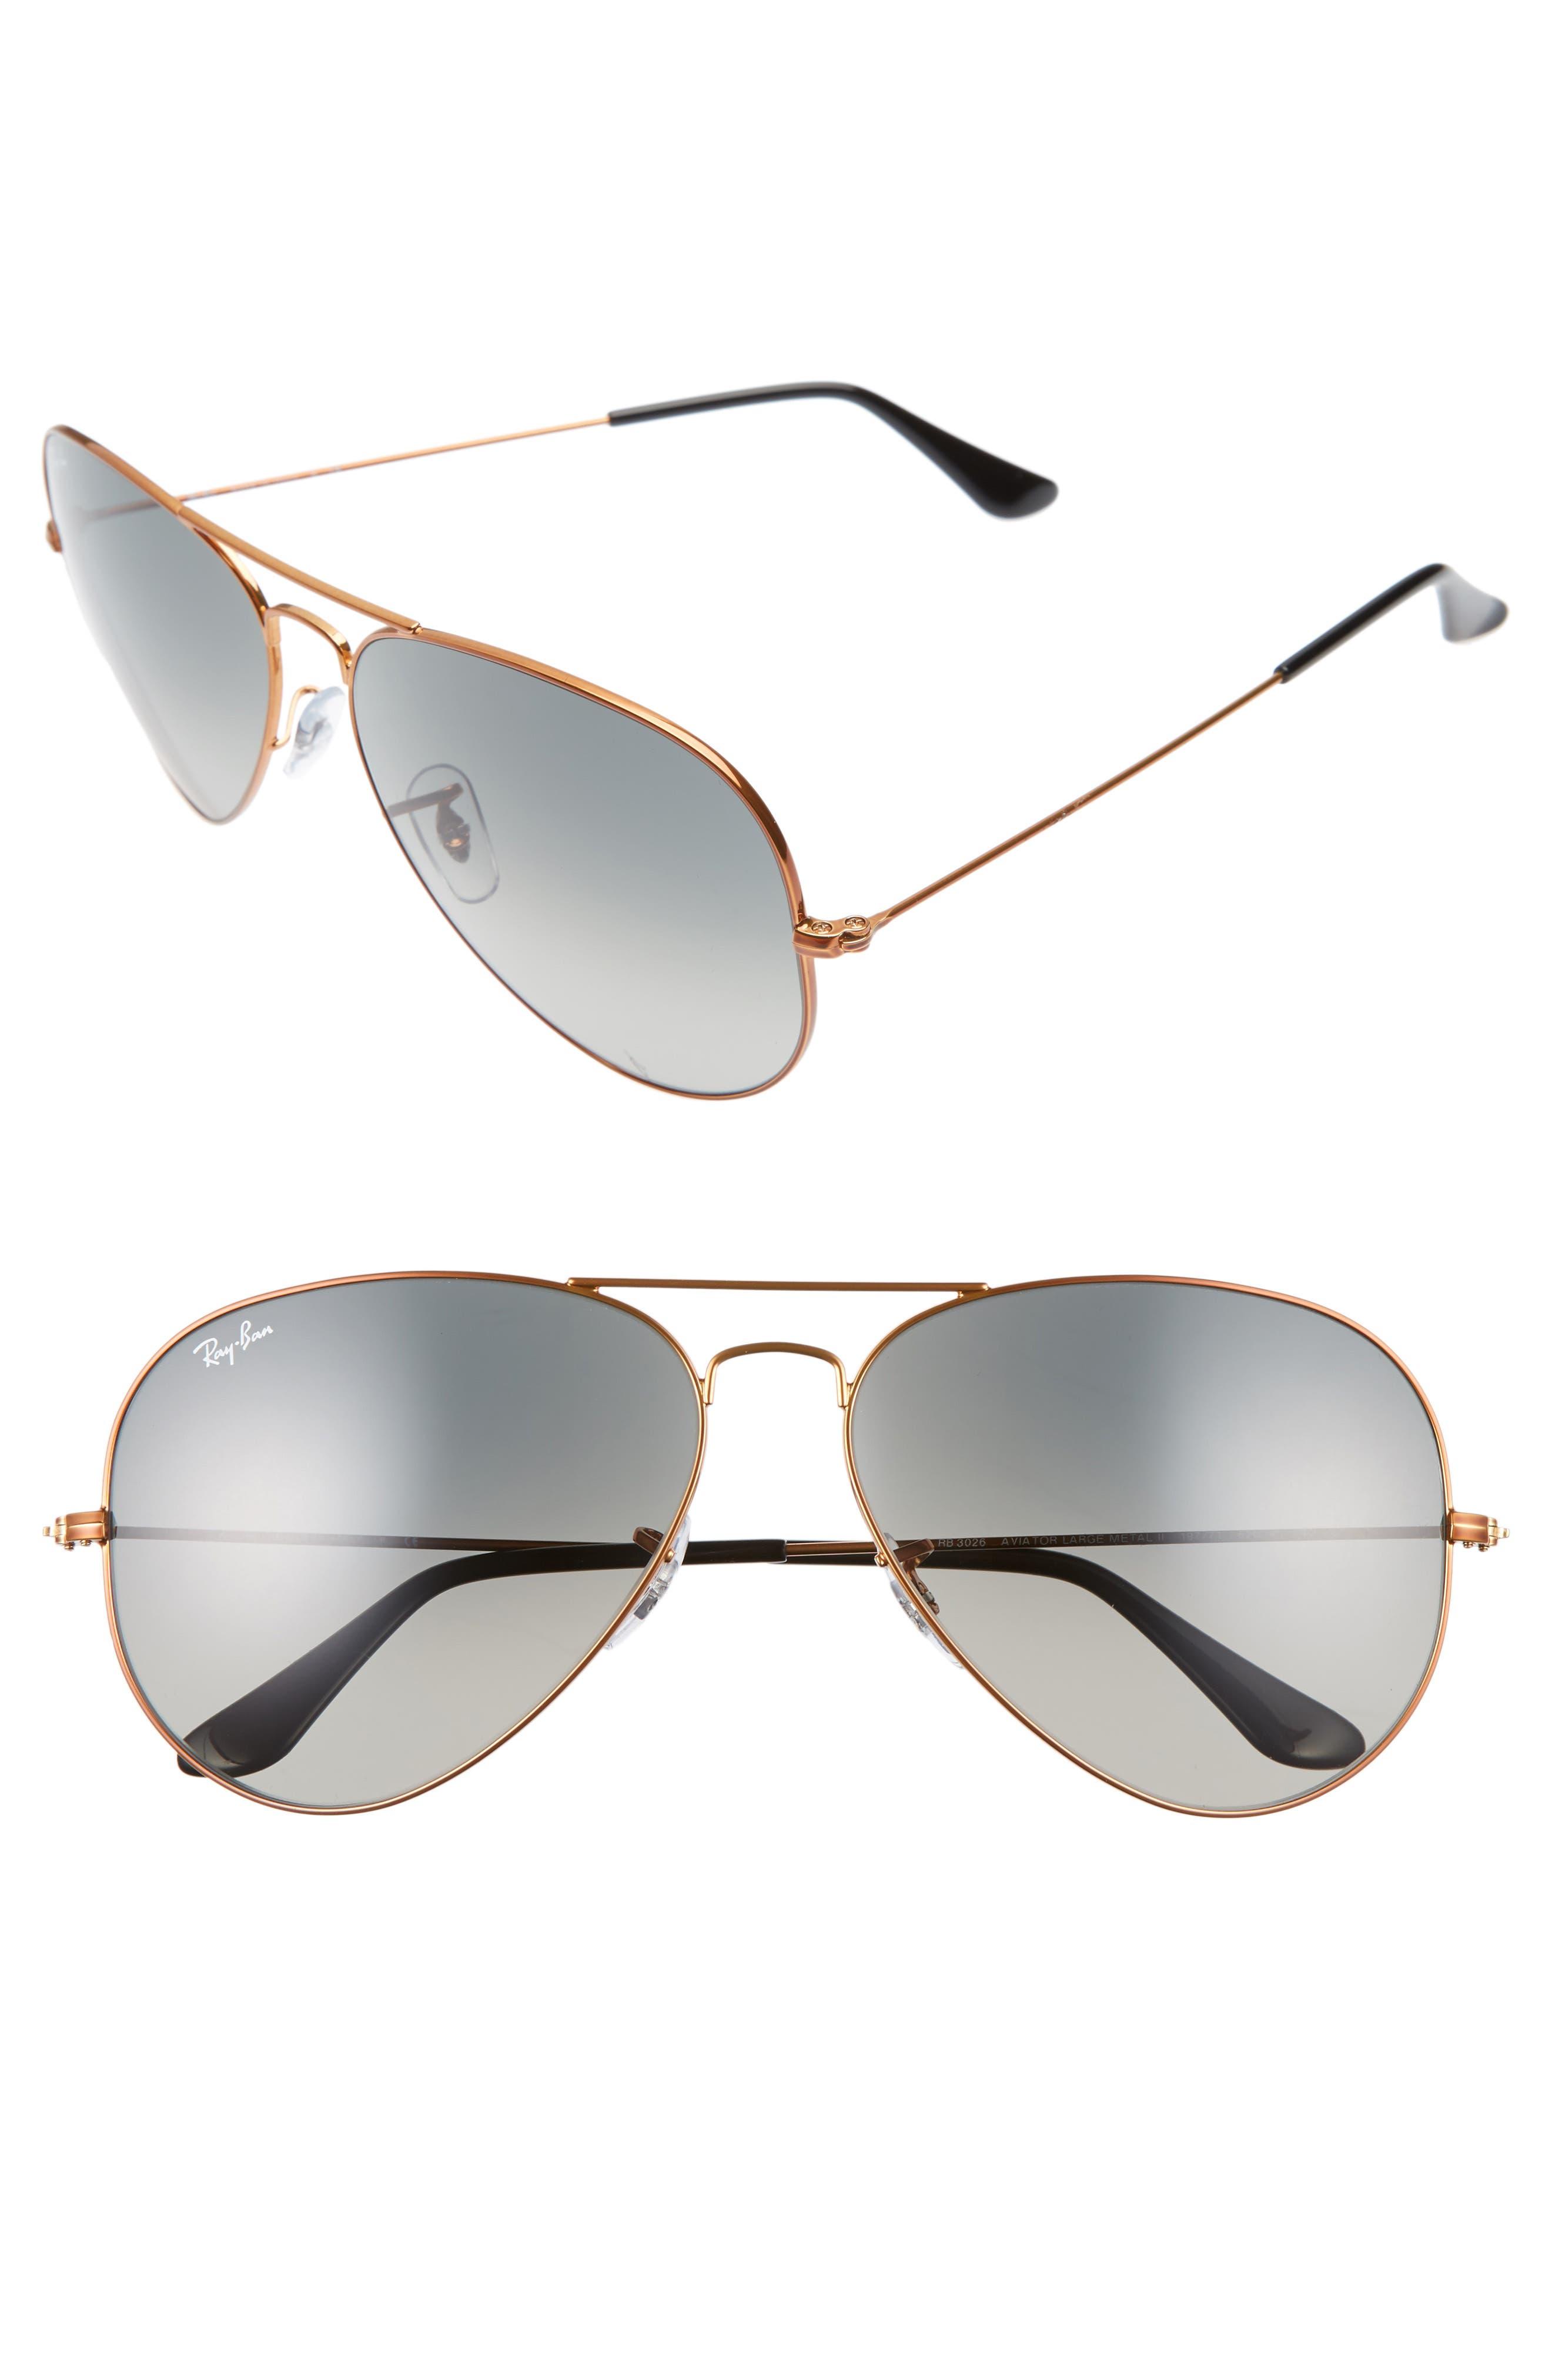 62mm Sunglasses,                         Main,                         color,